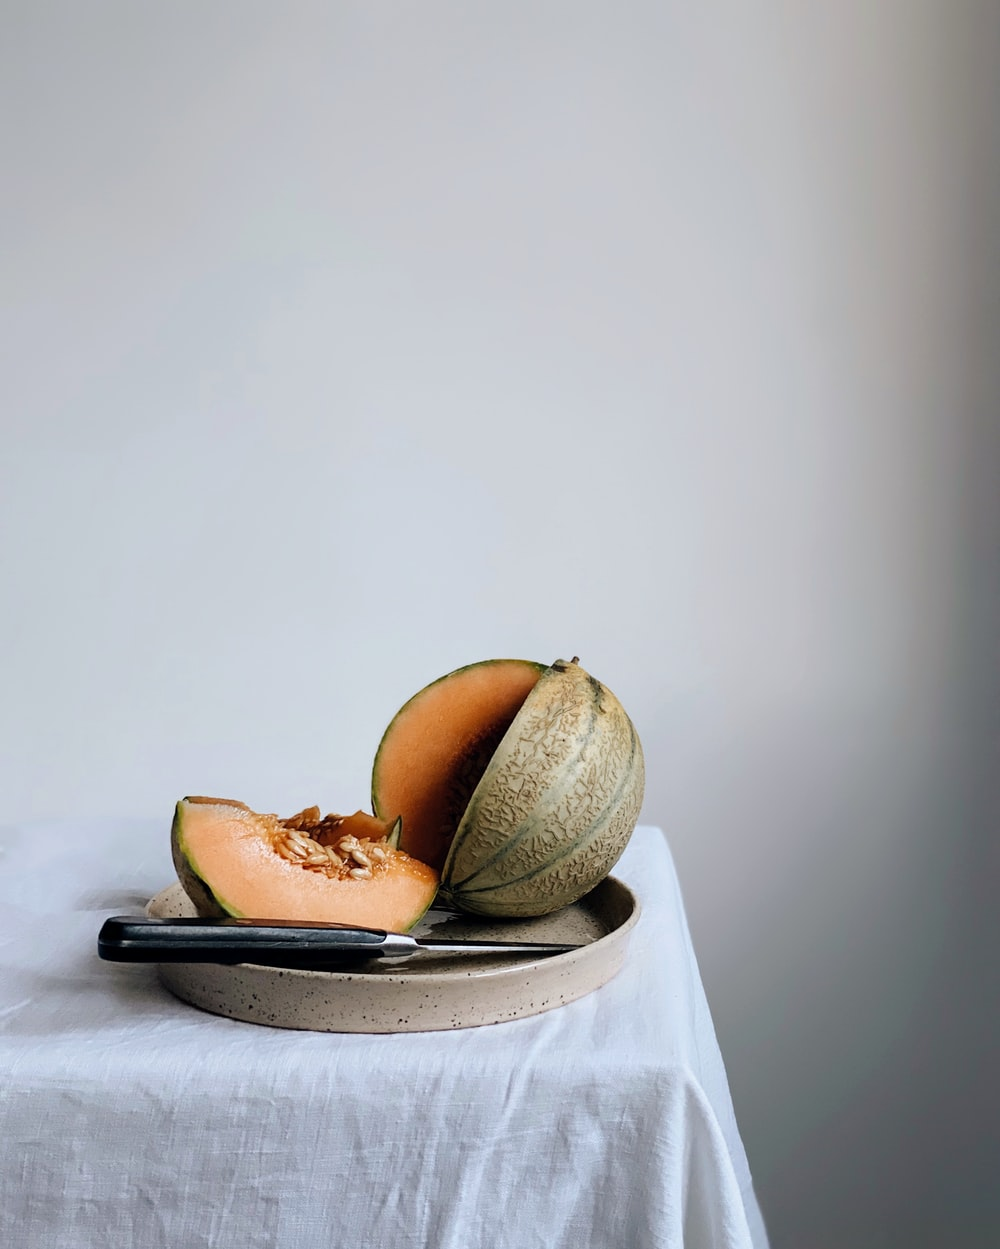 sliced of bread on white ceramic plate